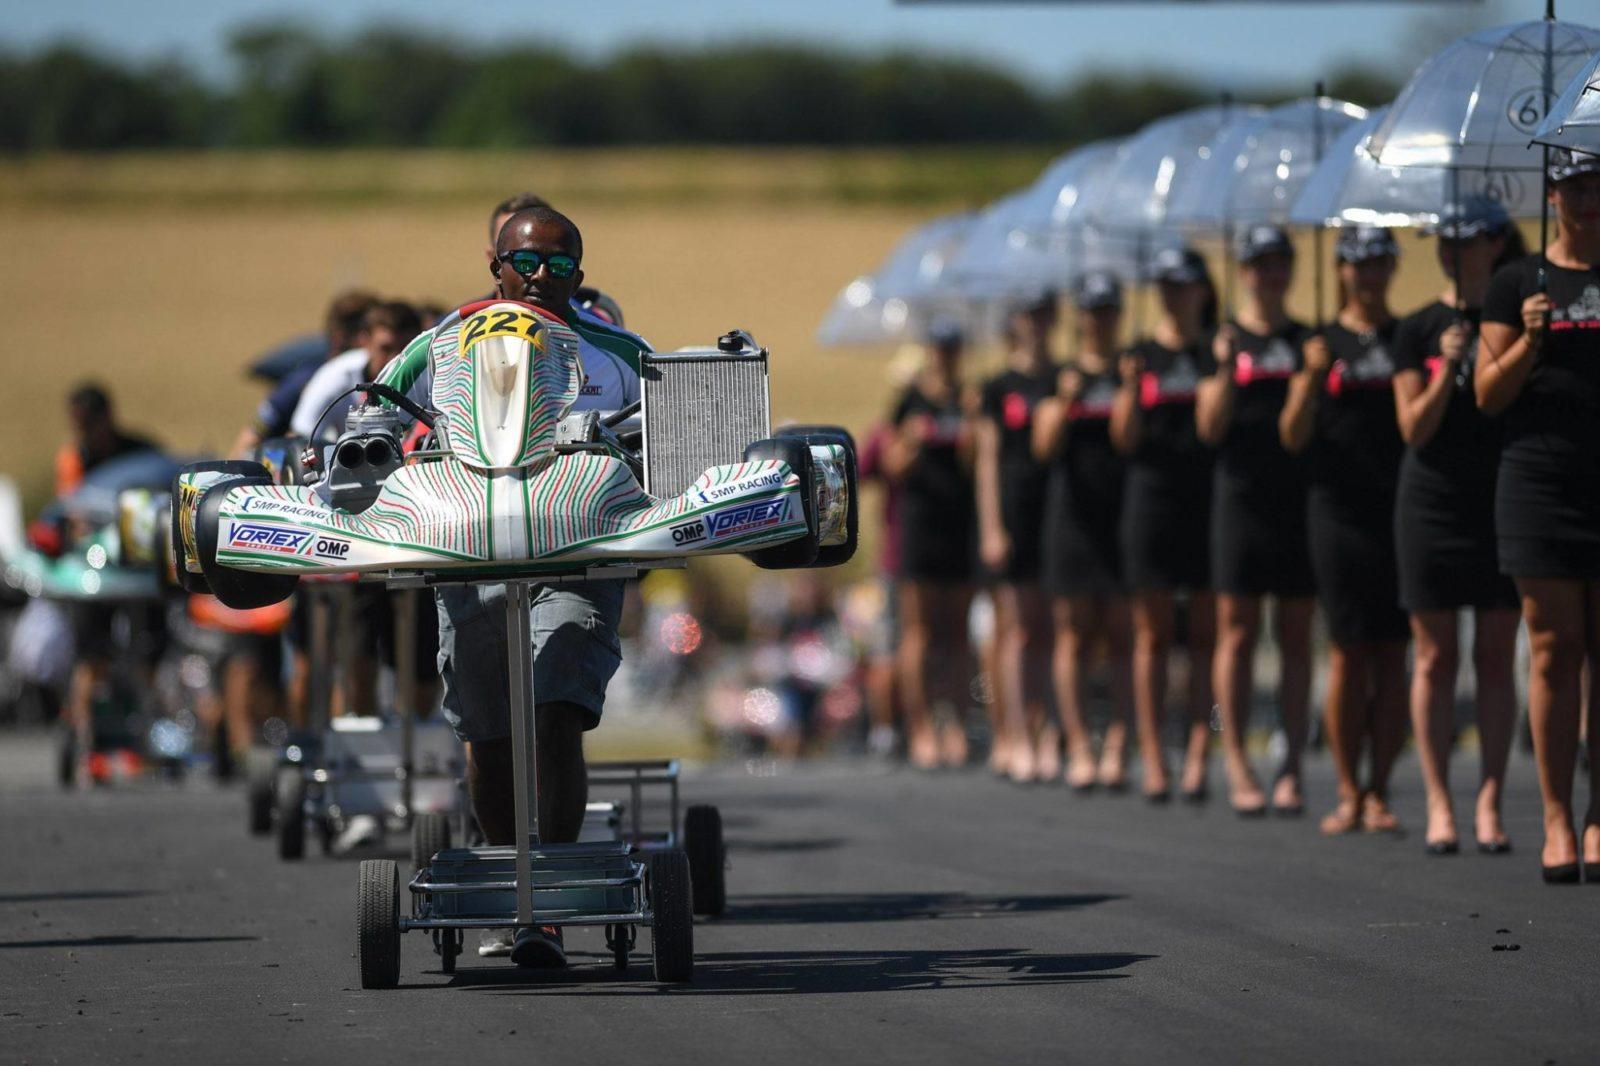 Tony Kart mechanic pushes kart to grid, Essay, France